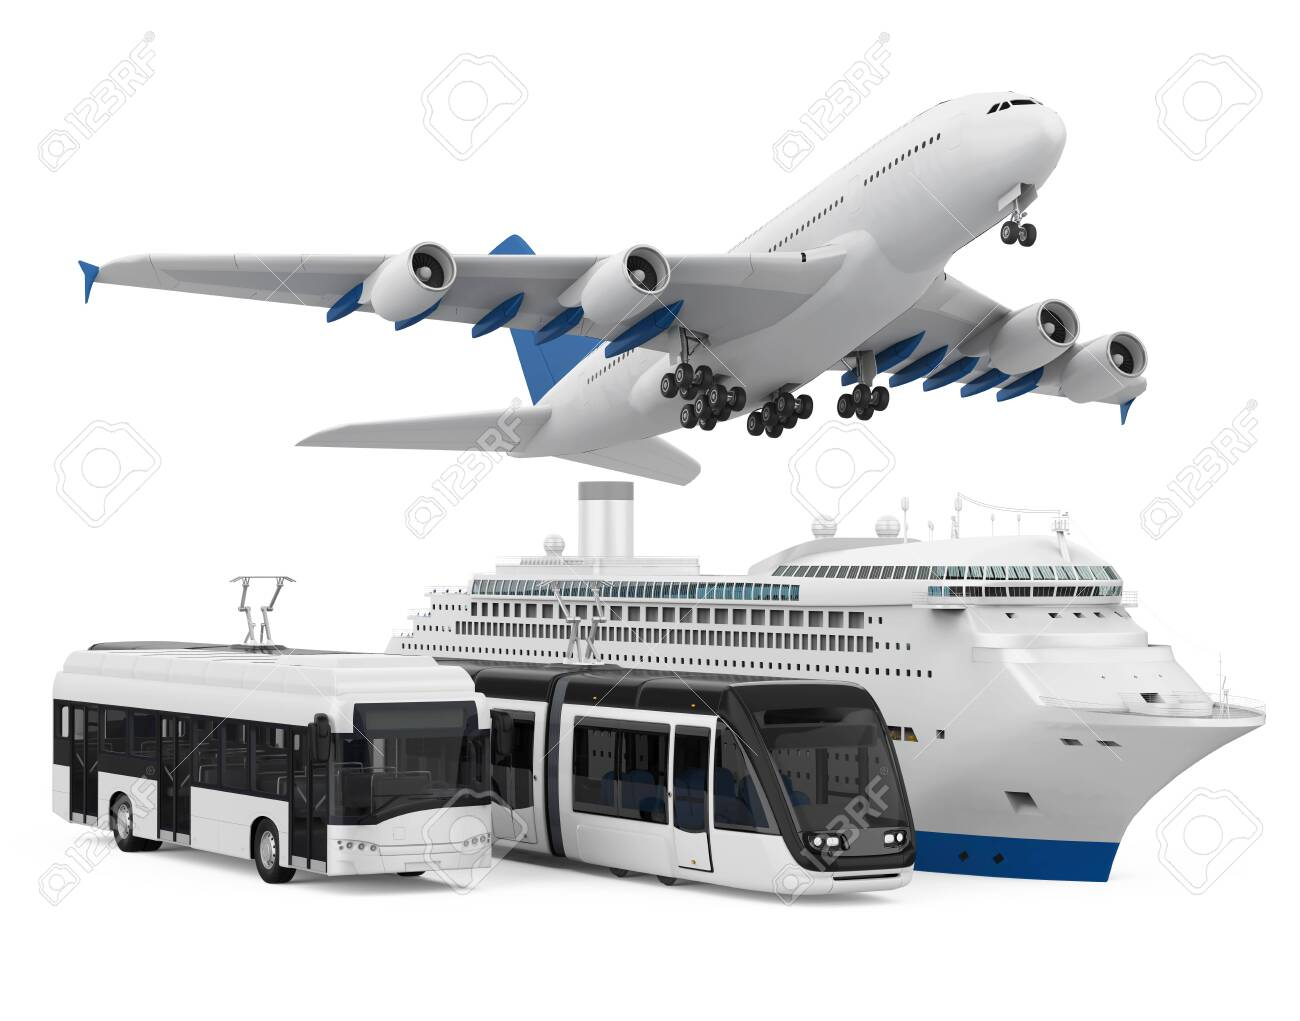 Fleet of Freight Transportation Isolated - 134287274